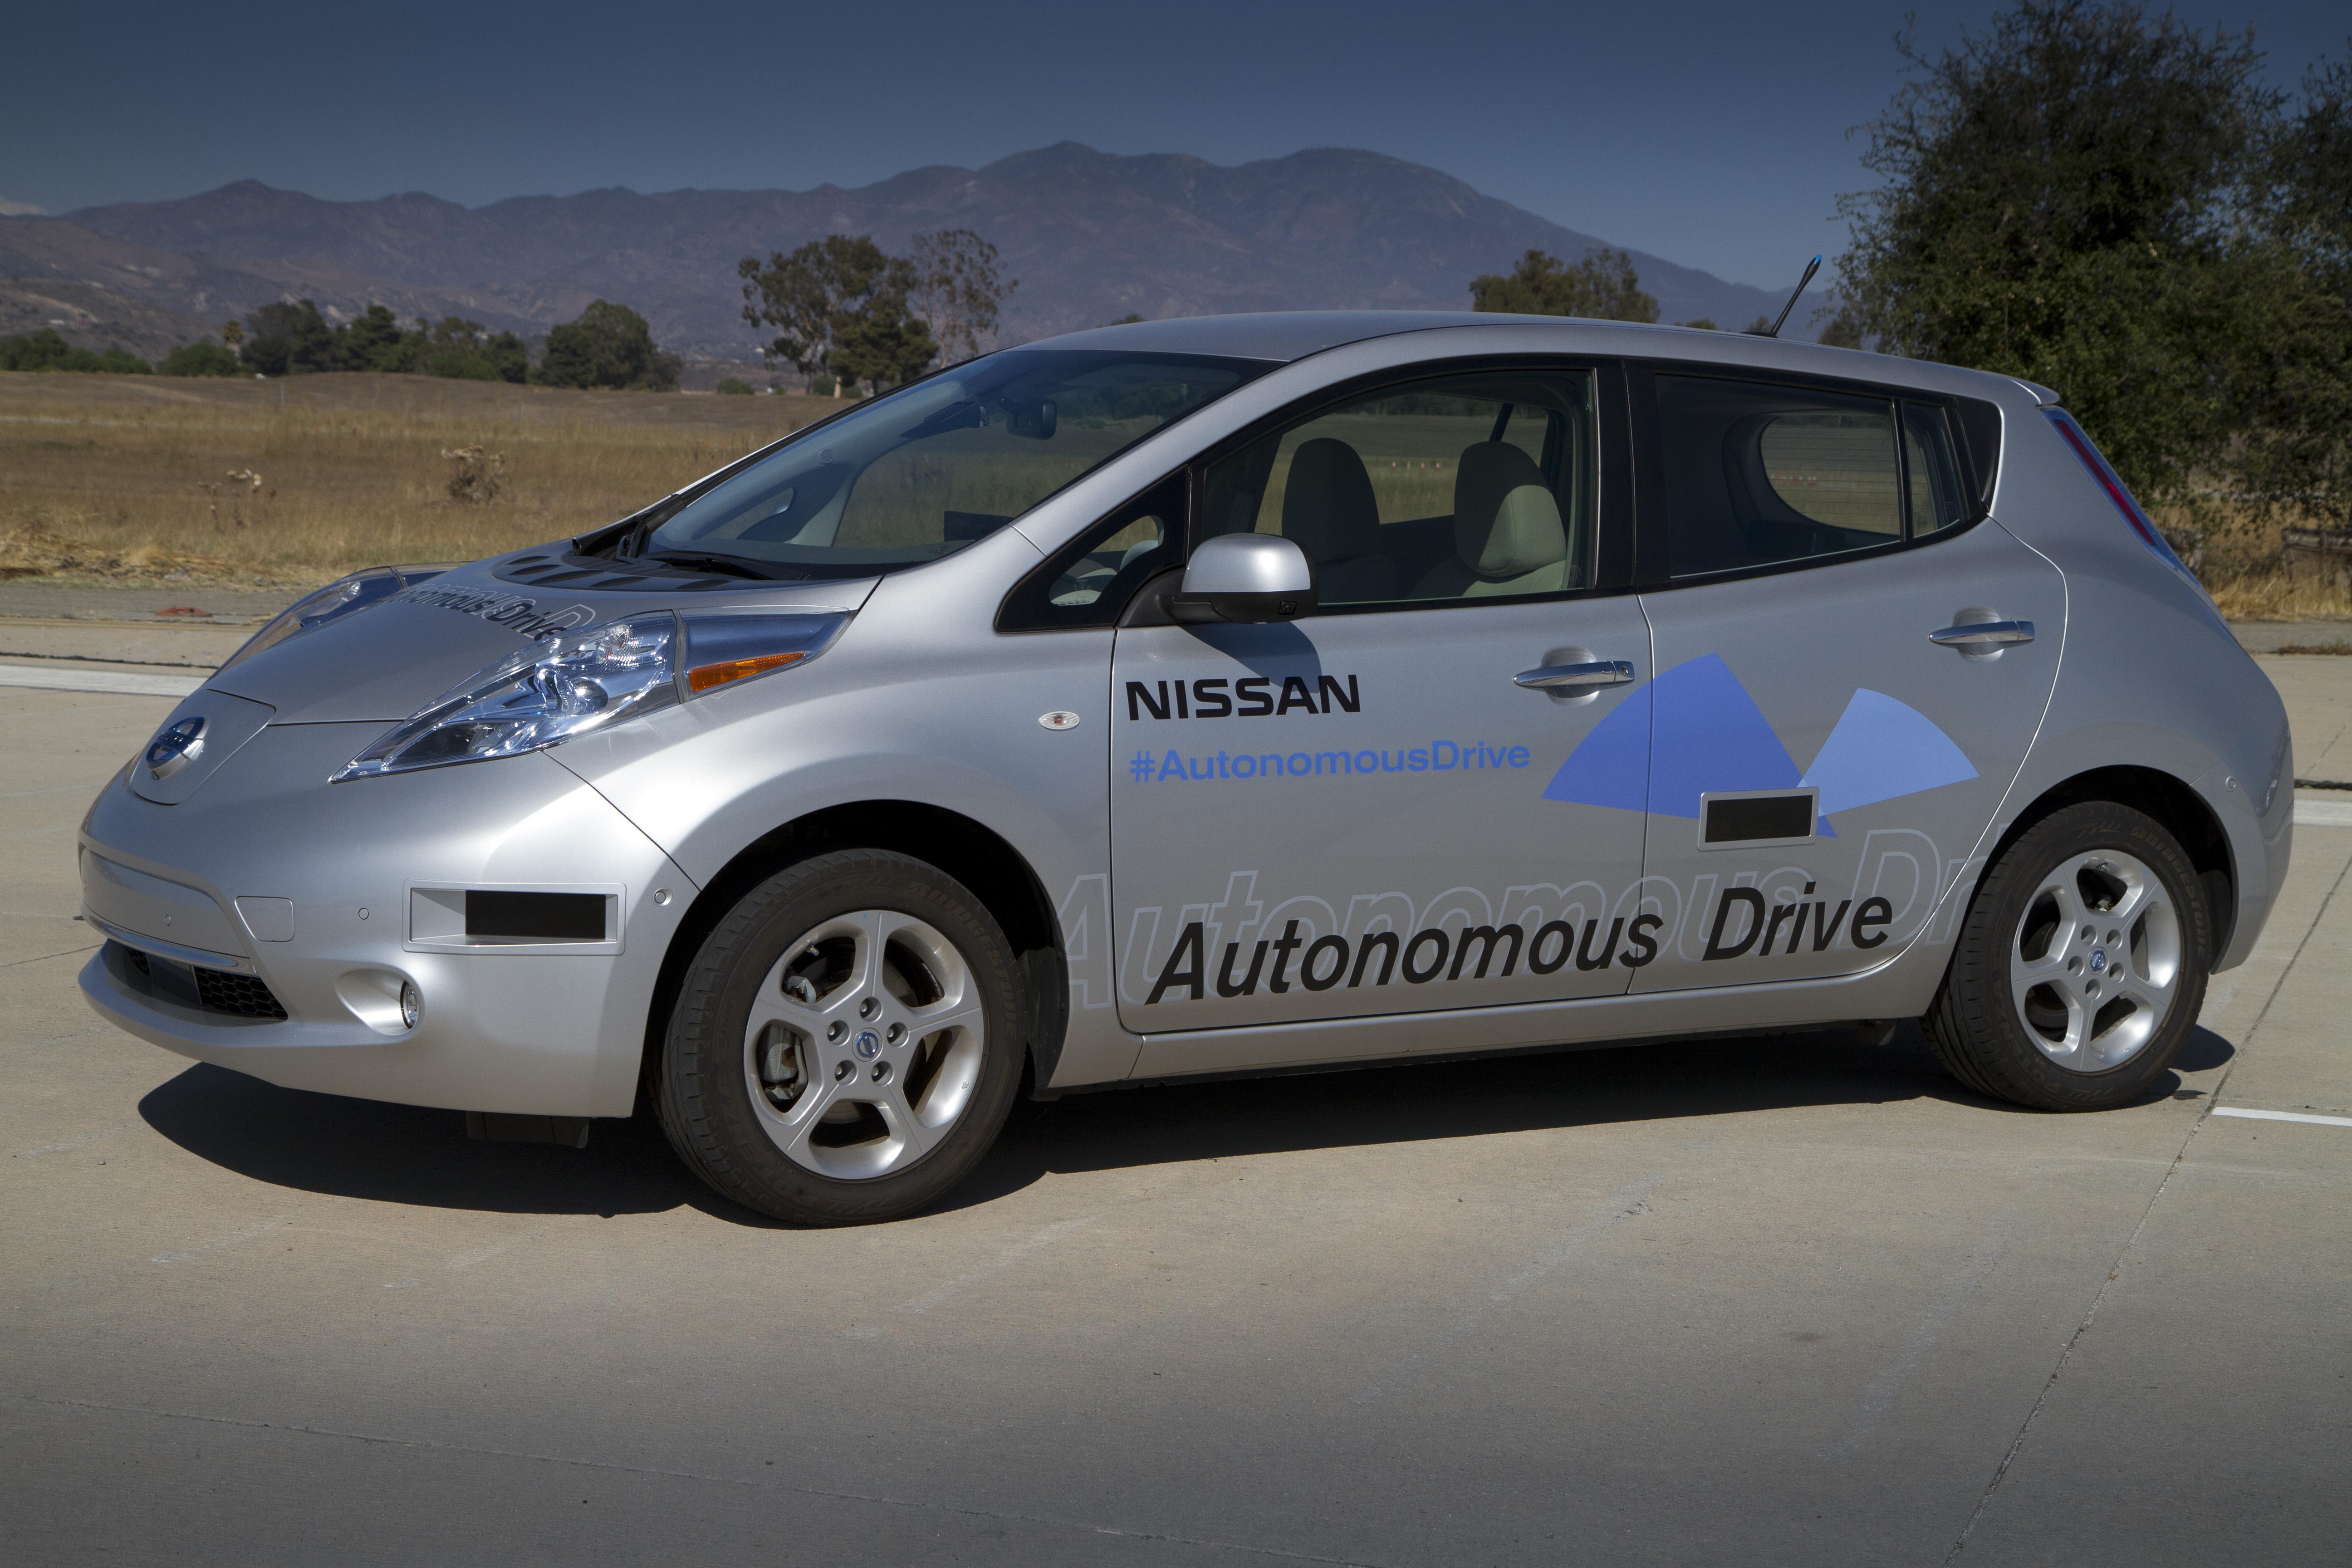 Nissan Autonomous Leaf Sets Me Dreaming Of What Could Be